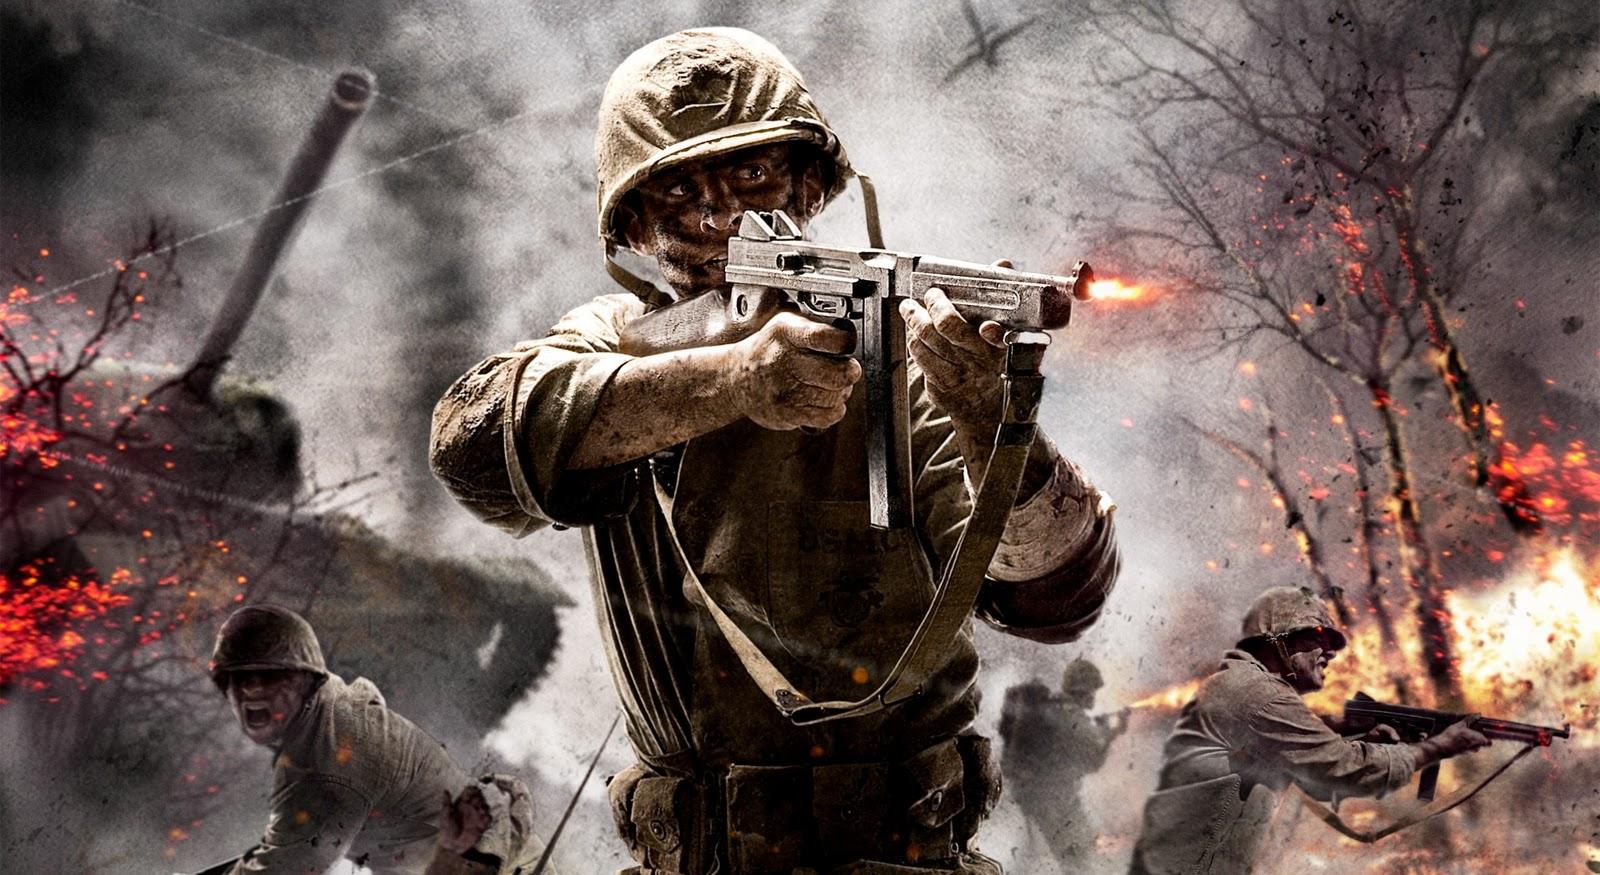 http://4.bp.blogspot.com/-ii1bc3l55mk/TWIRi4H6jWI/AAAAAAAAAIM/E_0Ie5YF994/s1600/Military+Man+War+With+Gun+3D+Hd+PC+Background+Wallpapers.jpg